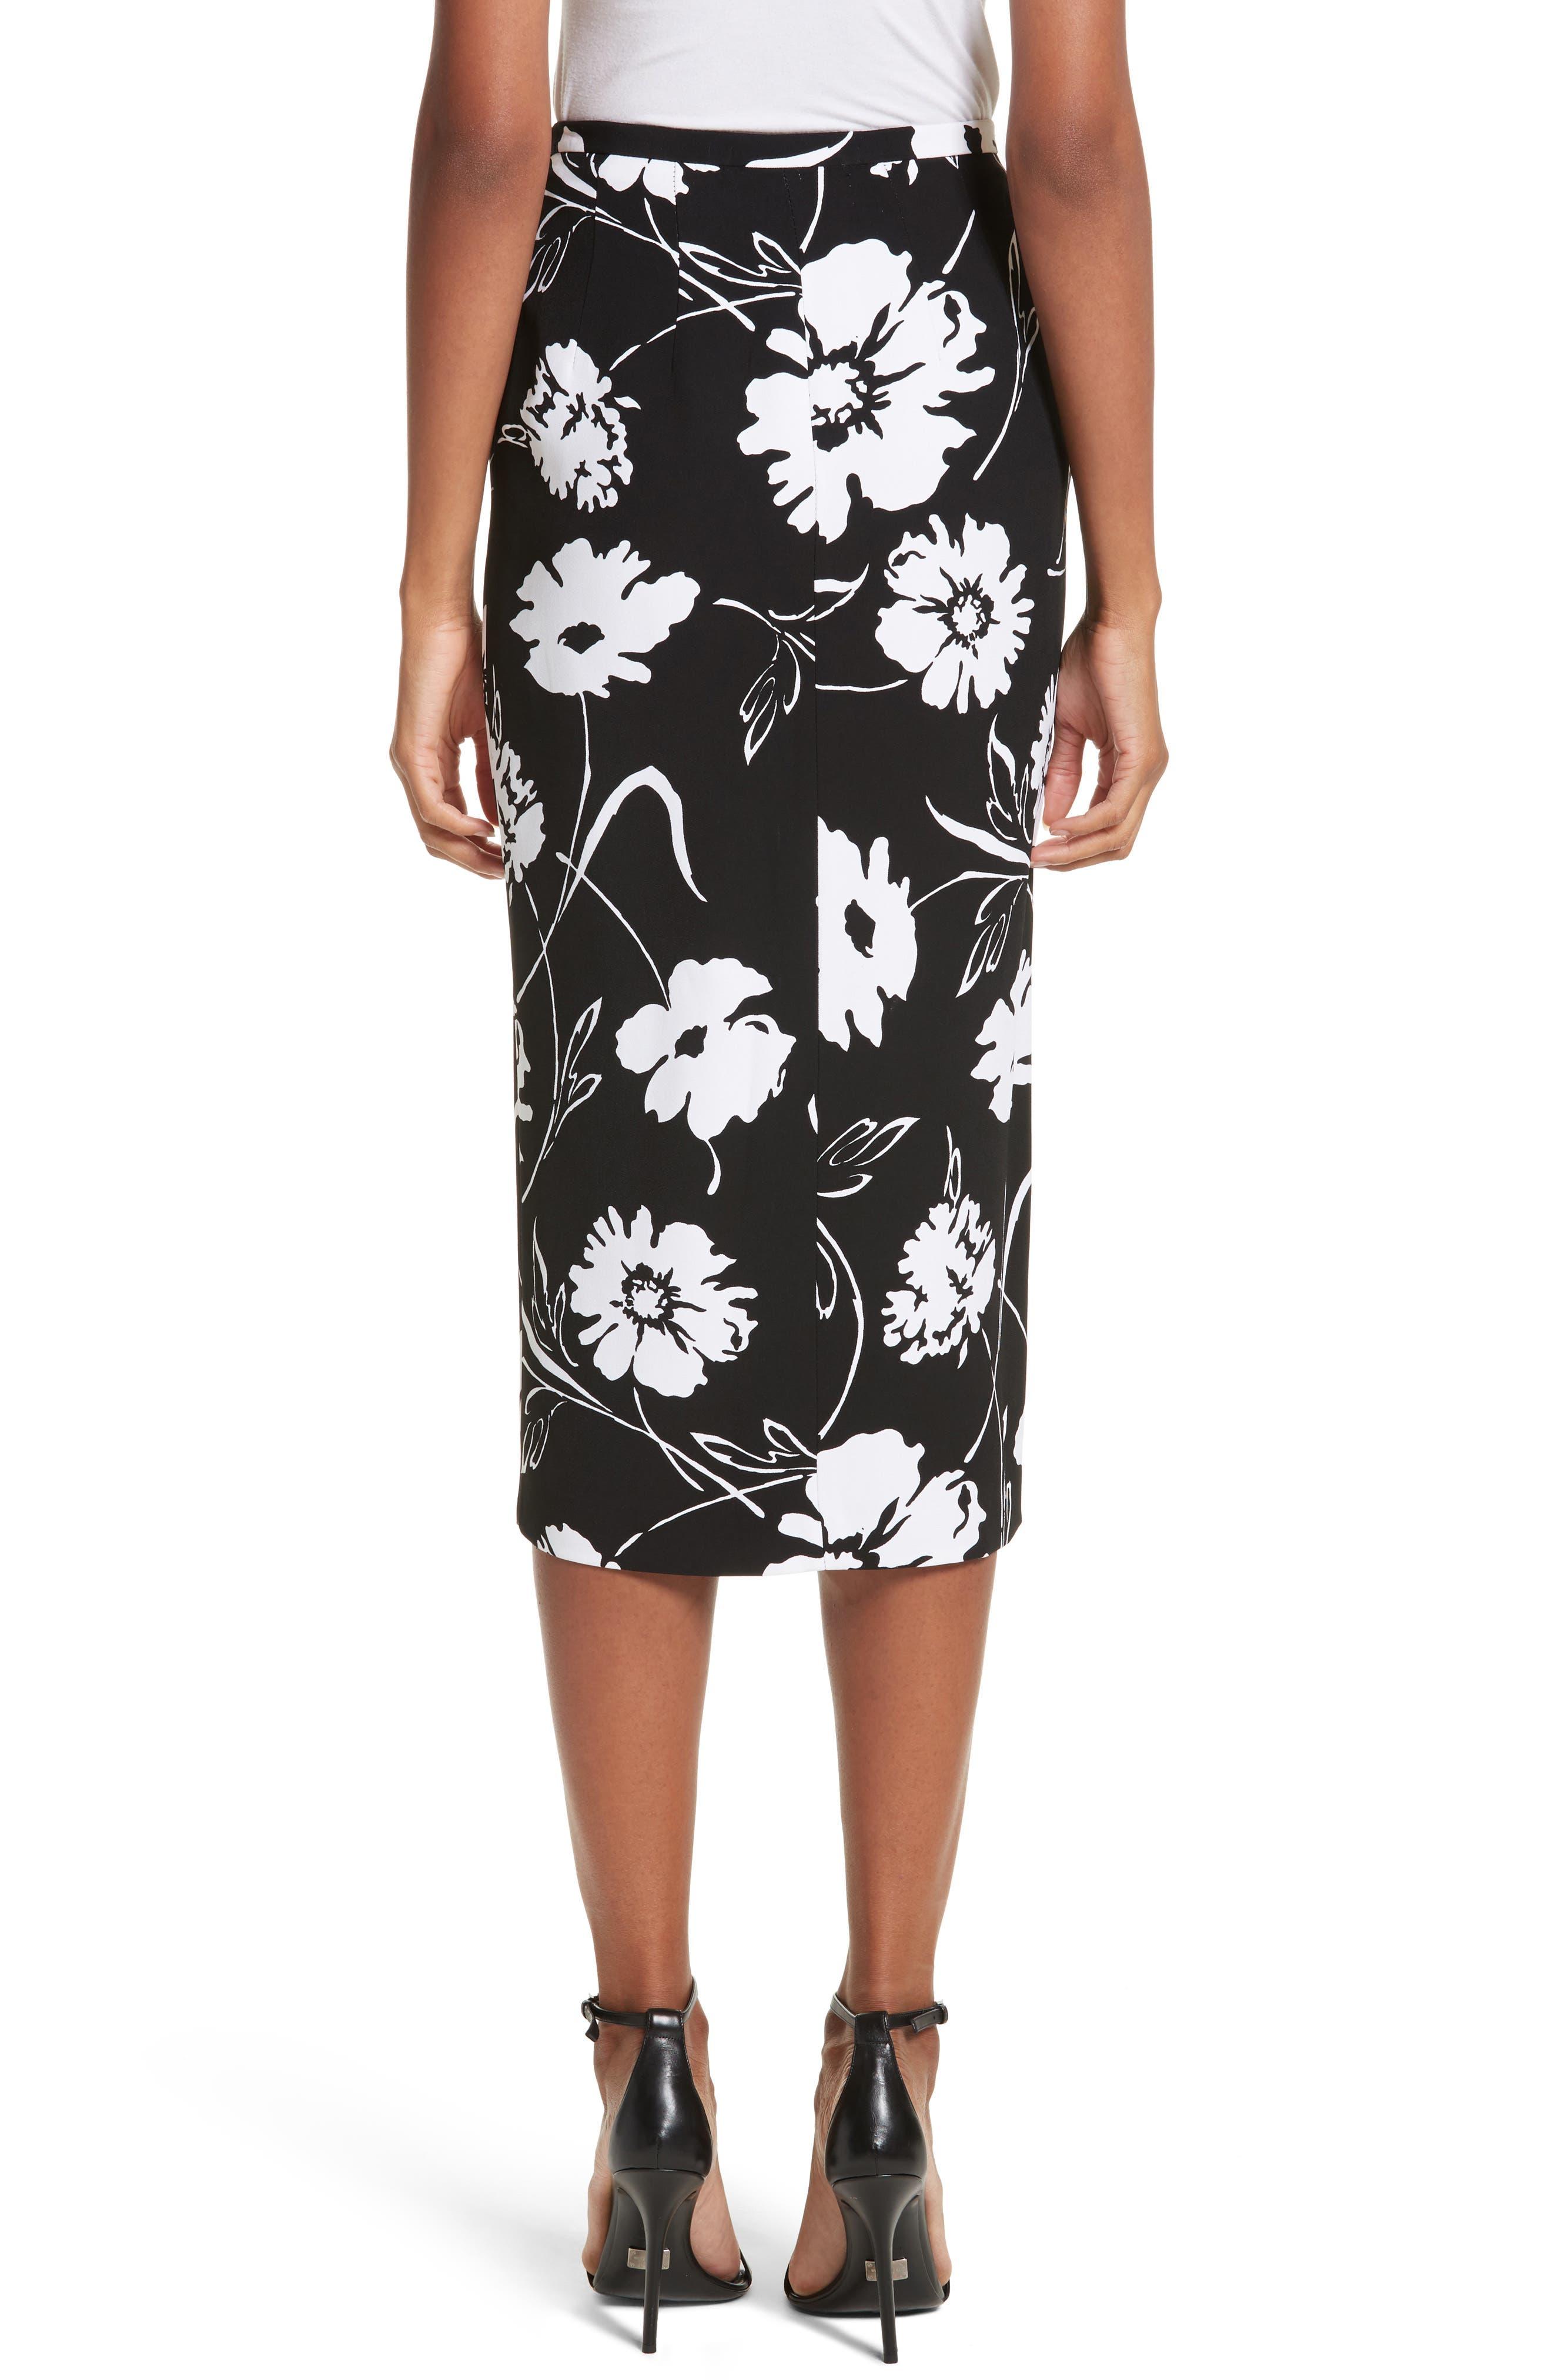 Floral Print Pencil Skirt,                             Alternate thumbnail 2, color,                             Black / White